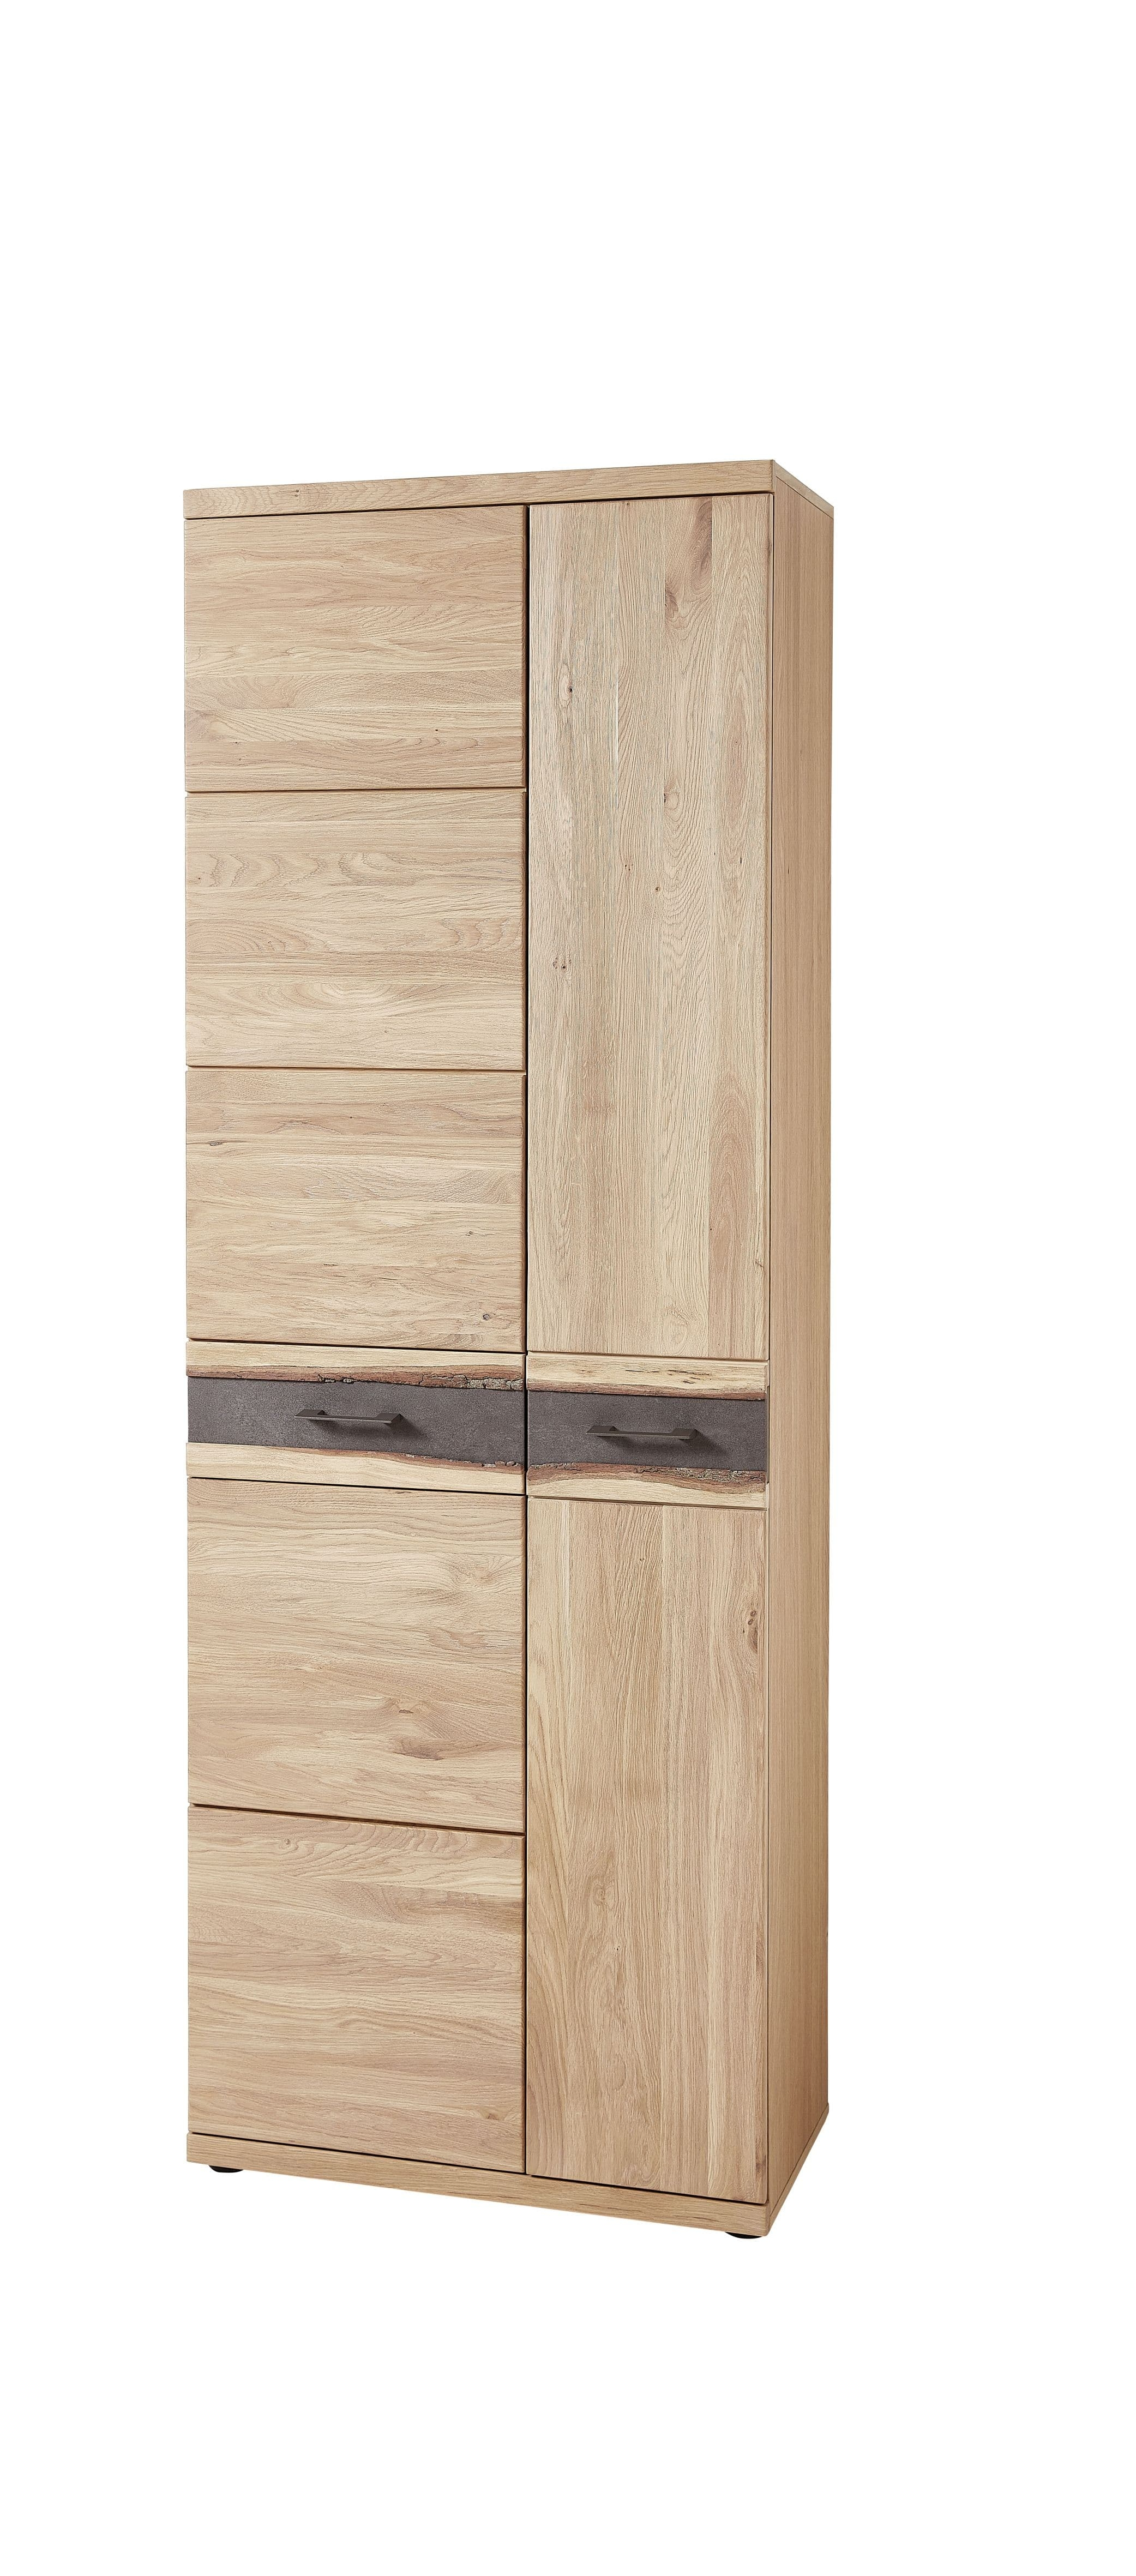 Dulap hol din furnir si lemn cu 2 usi, Crispin Natur, l71xA39xH202 cm imagine